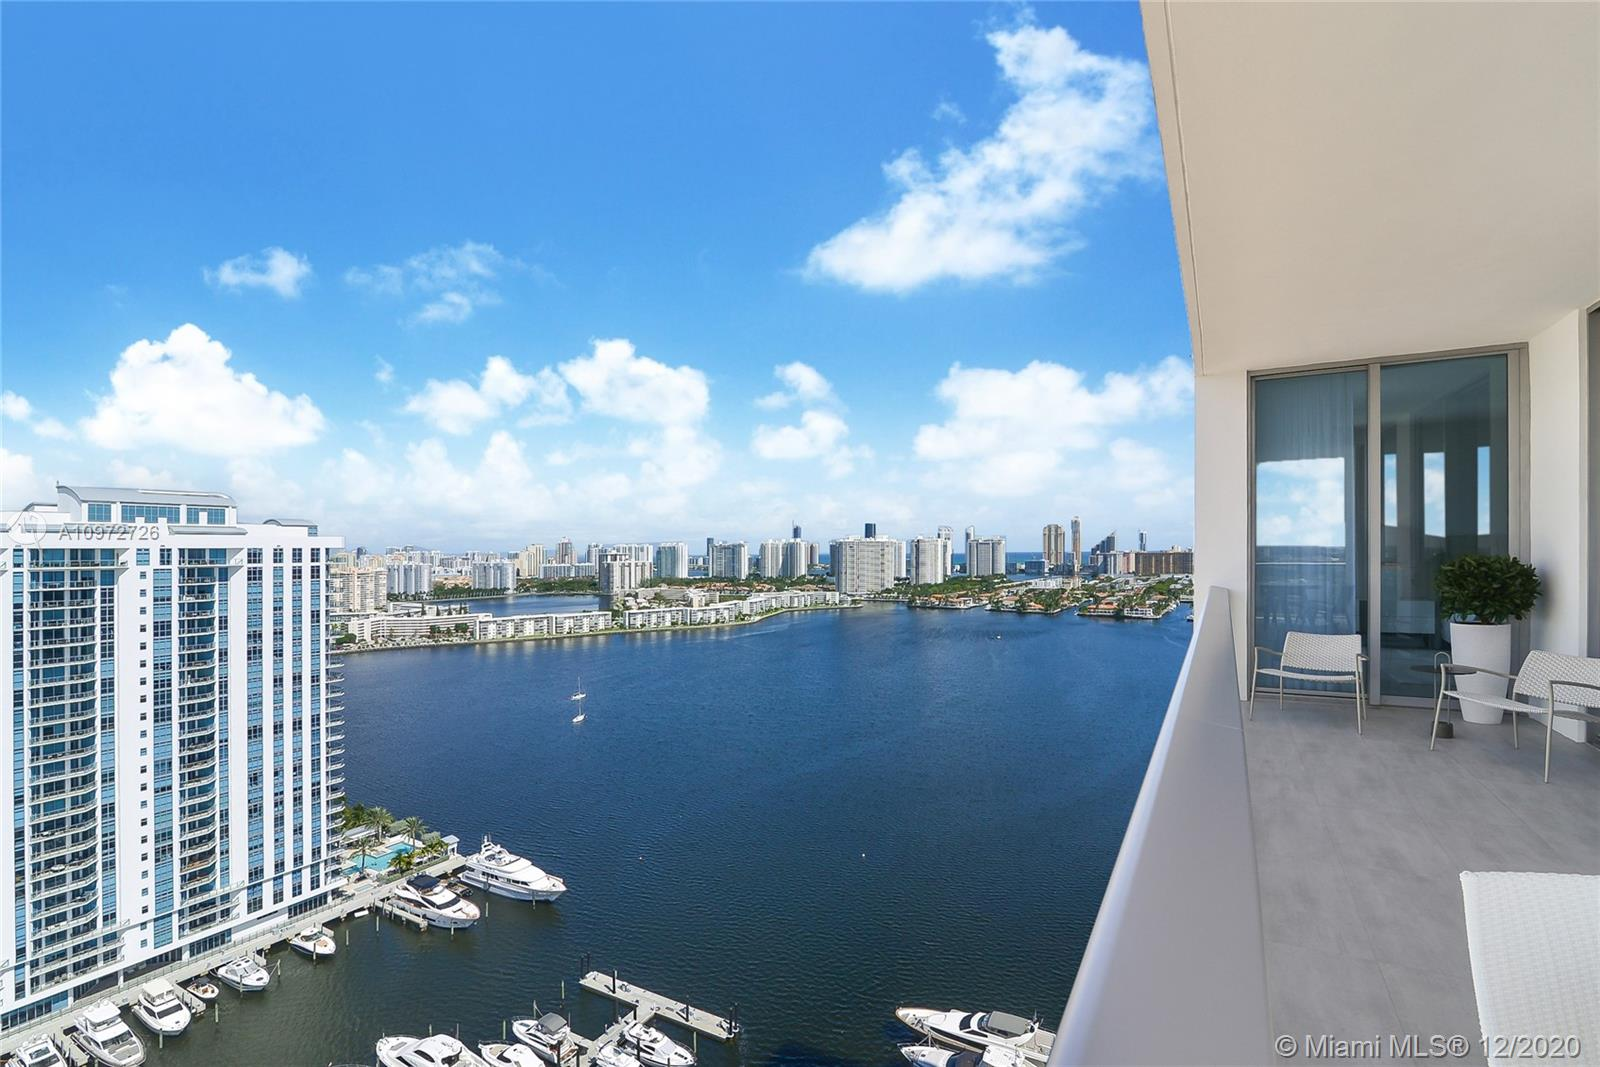 Marina Palms 1 #PH1 - 17111 Biscayne Blvd #PH1, North Miami Beach, FL 33160